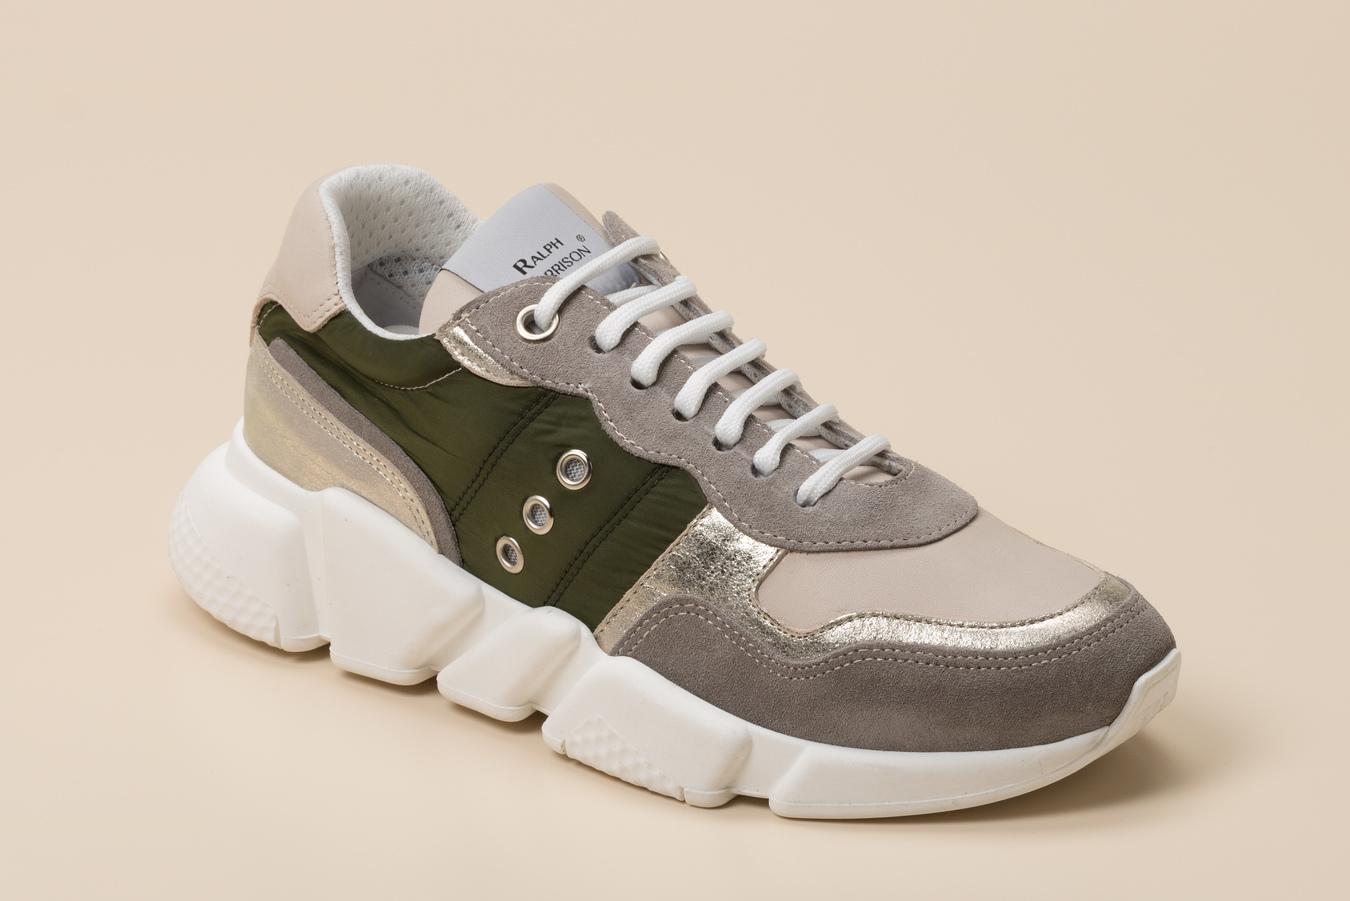 Ralph Harrison Damen Sneaker in beige kaufen | Zumnorde Online Shop